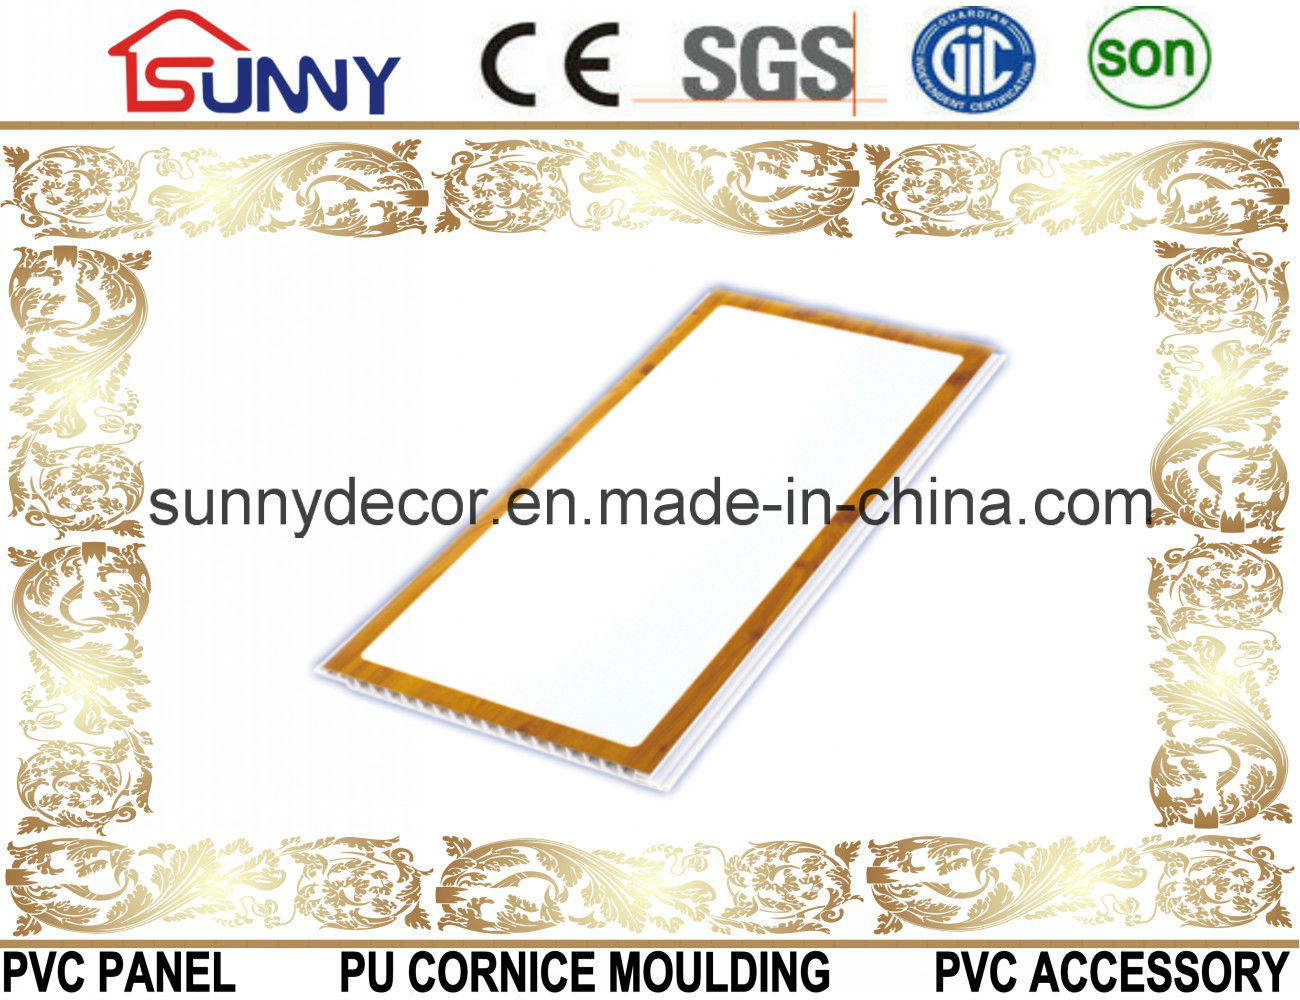 Lamination PVC Panel PVC Ceiling PVC Wall Panel Decoration Waterproof Material